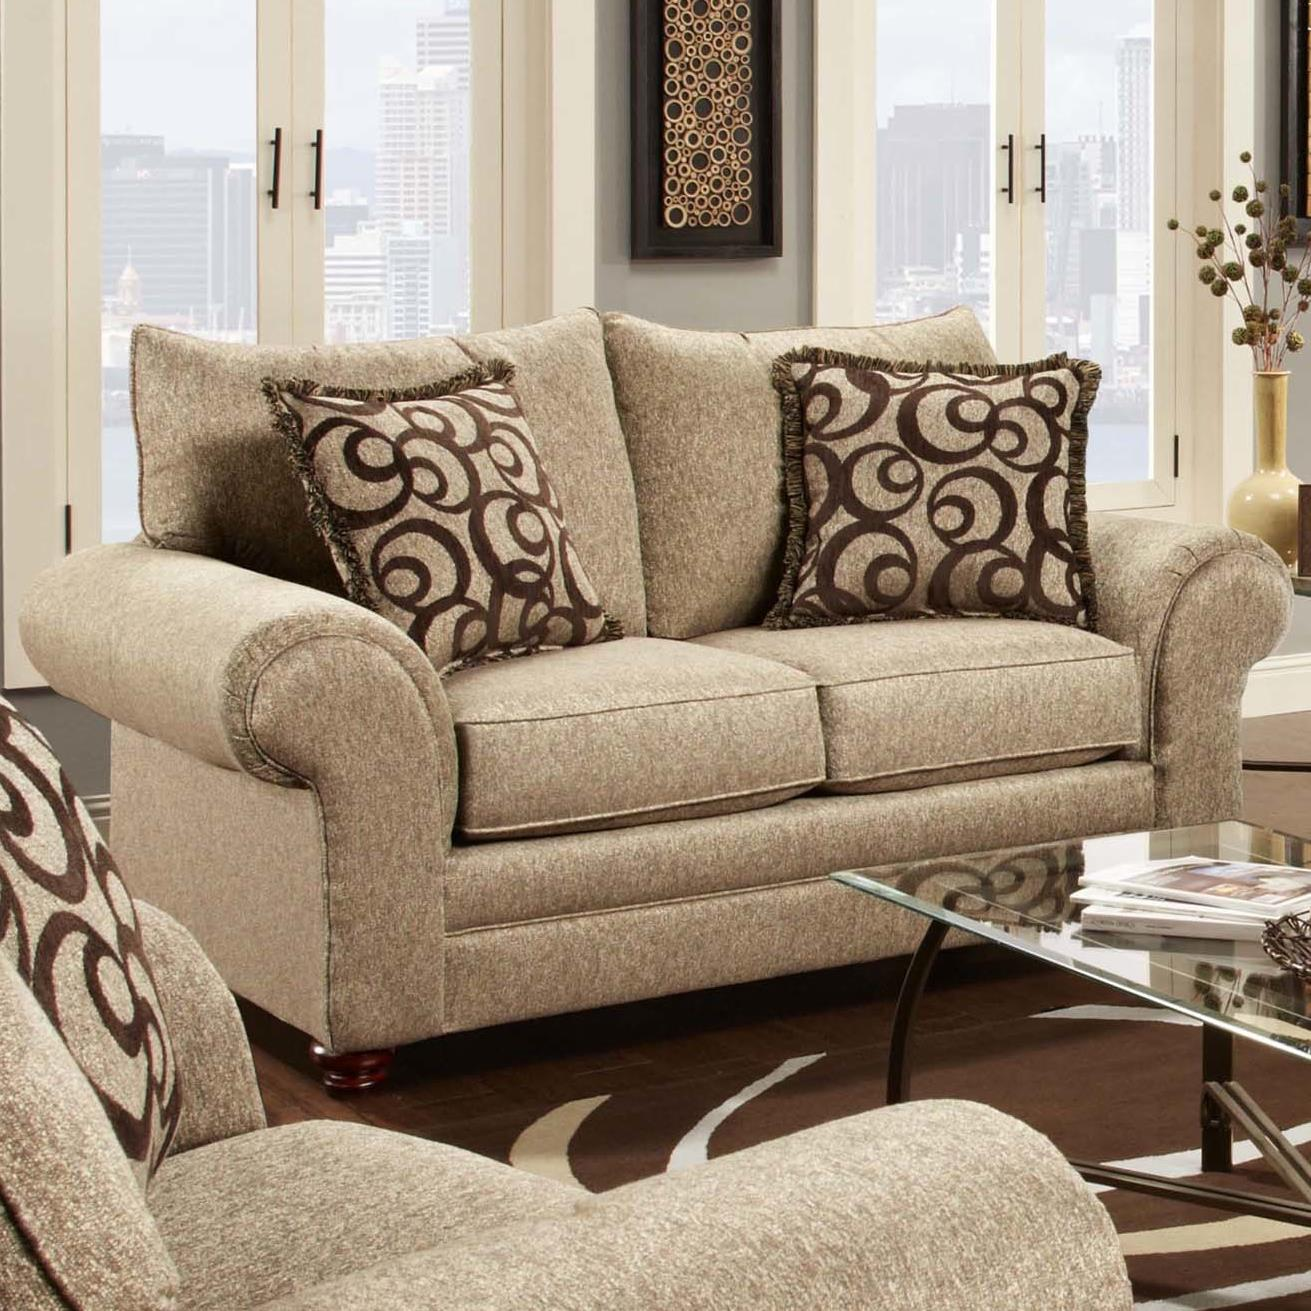 Washington Furniture 2120 Traditional Loveseat - Item Number: 2122-750 Mix Cafe